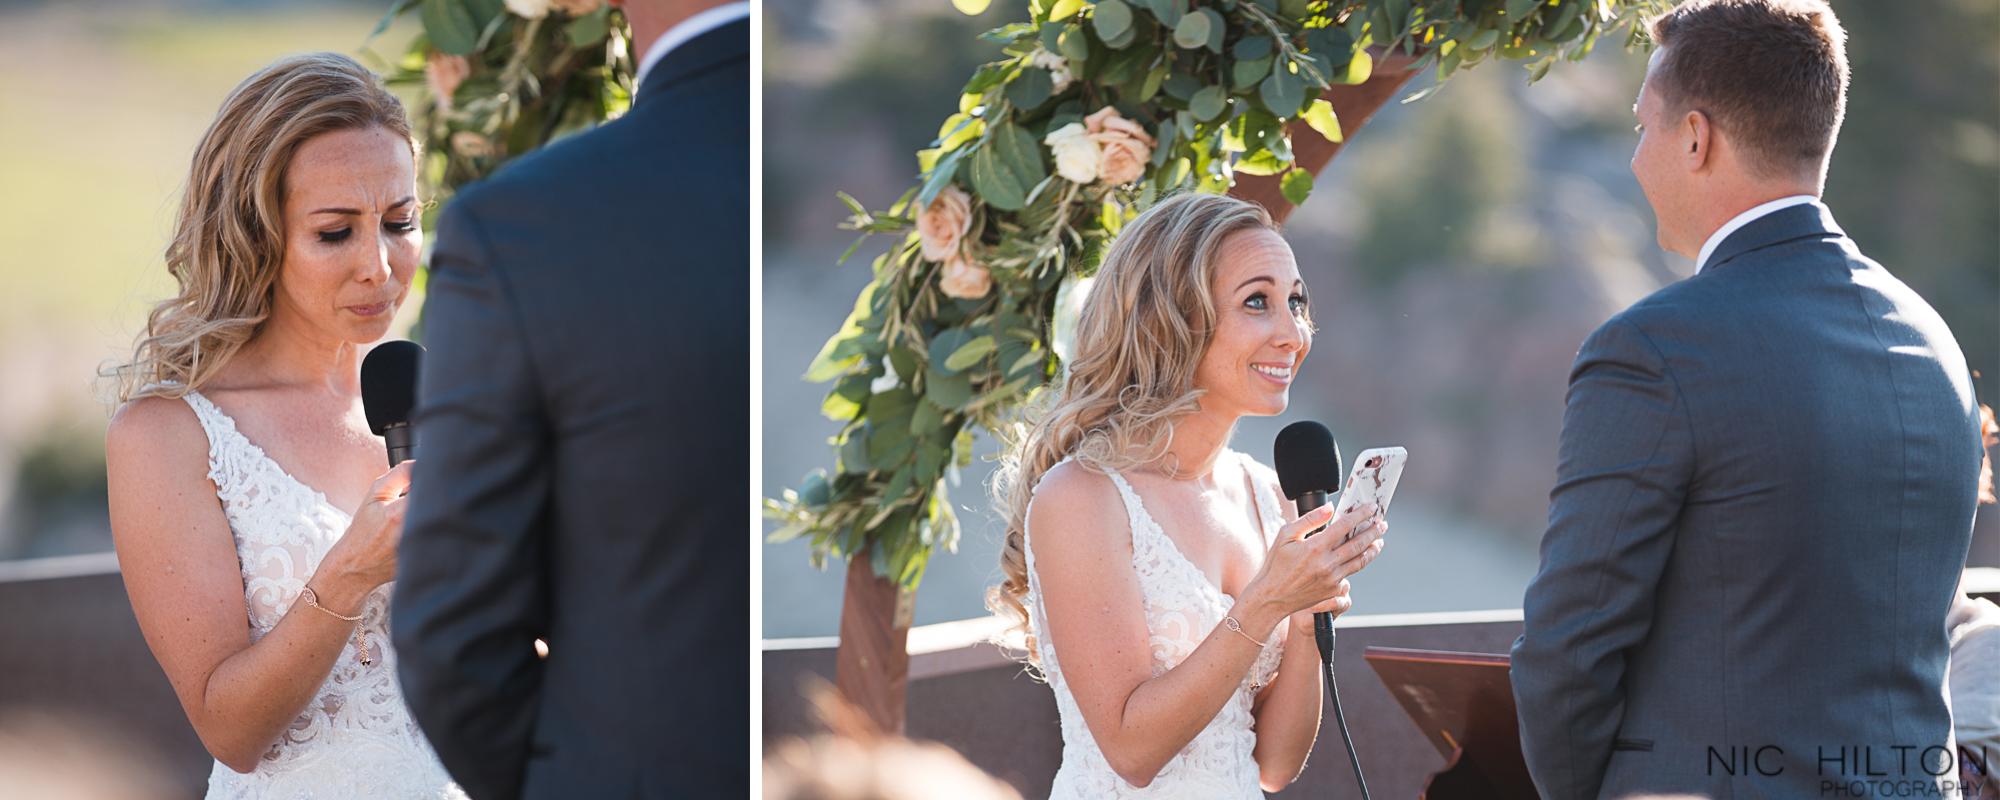 Mammoth-mountain-wedding-vows.jpg